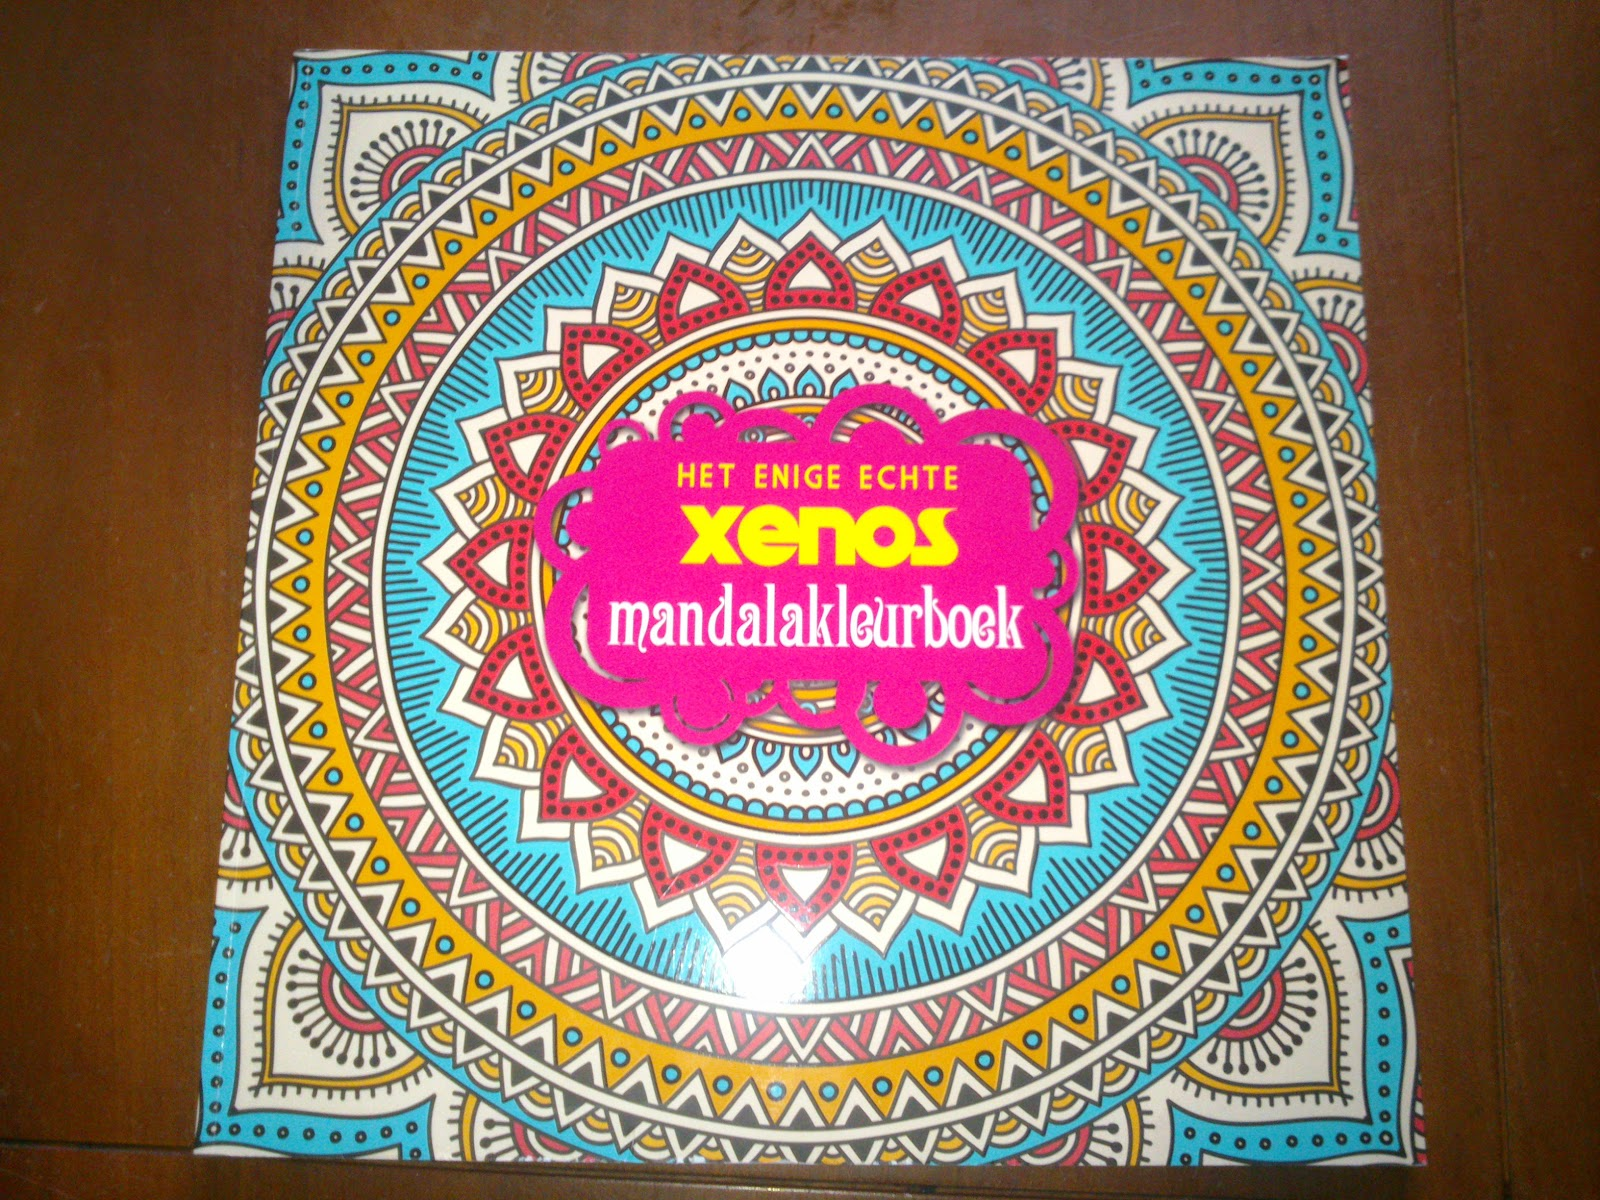 Mandala Kleurplaten Bestellen.Gastreview Het Enige Echte Xenos Mandala Kleurboek Perfectsourcolors